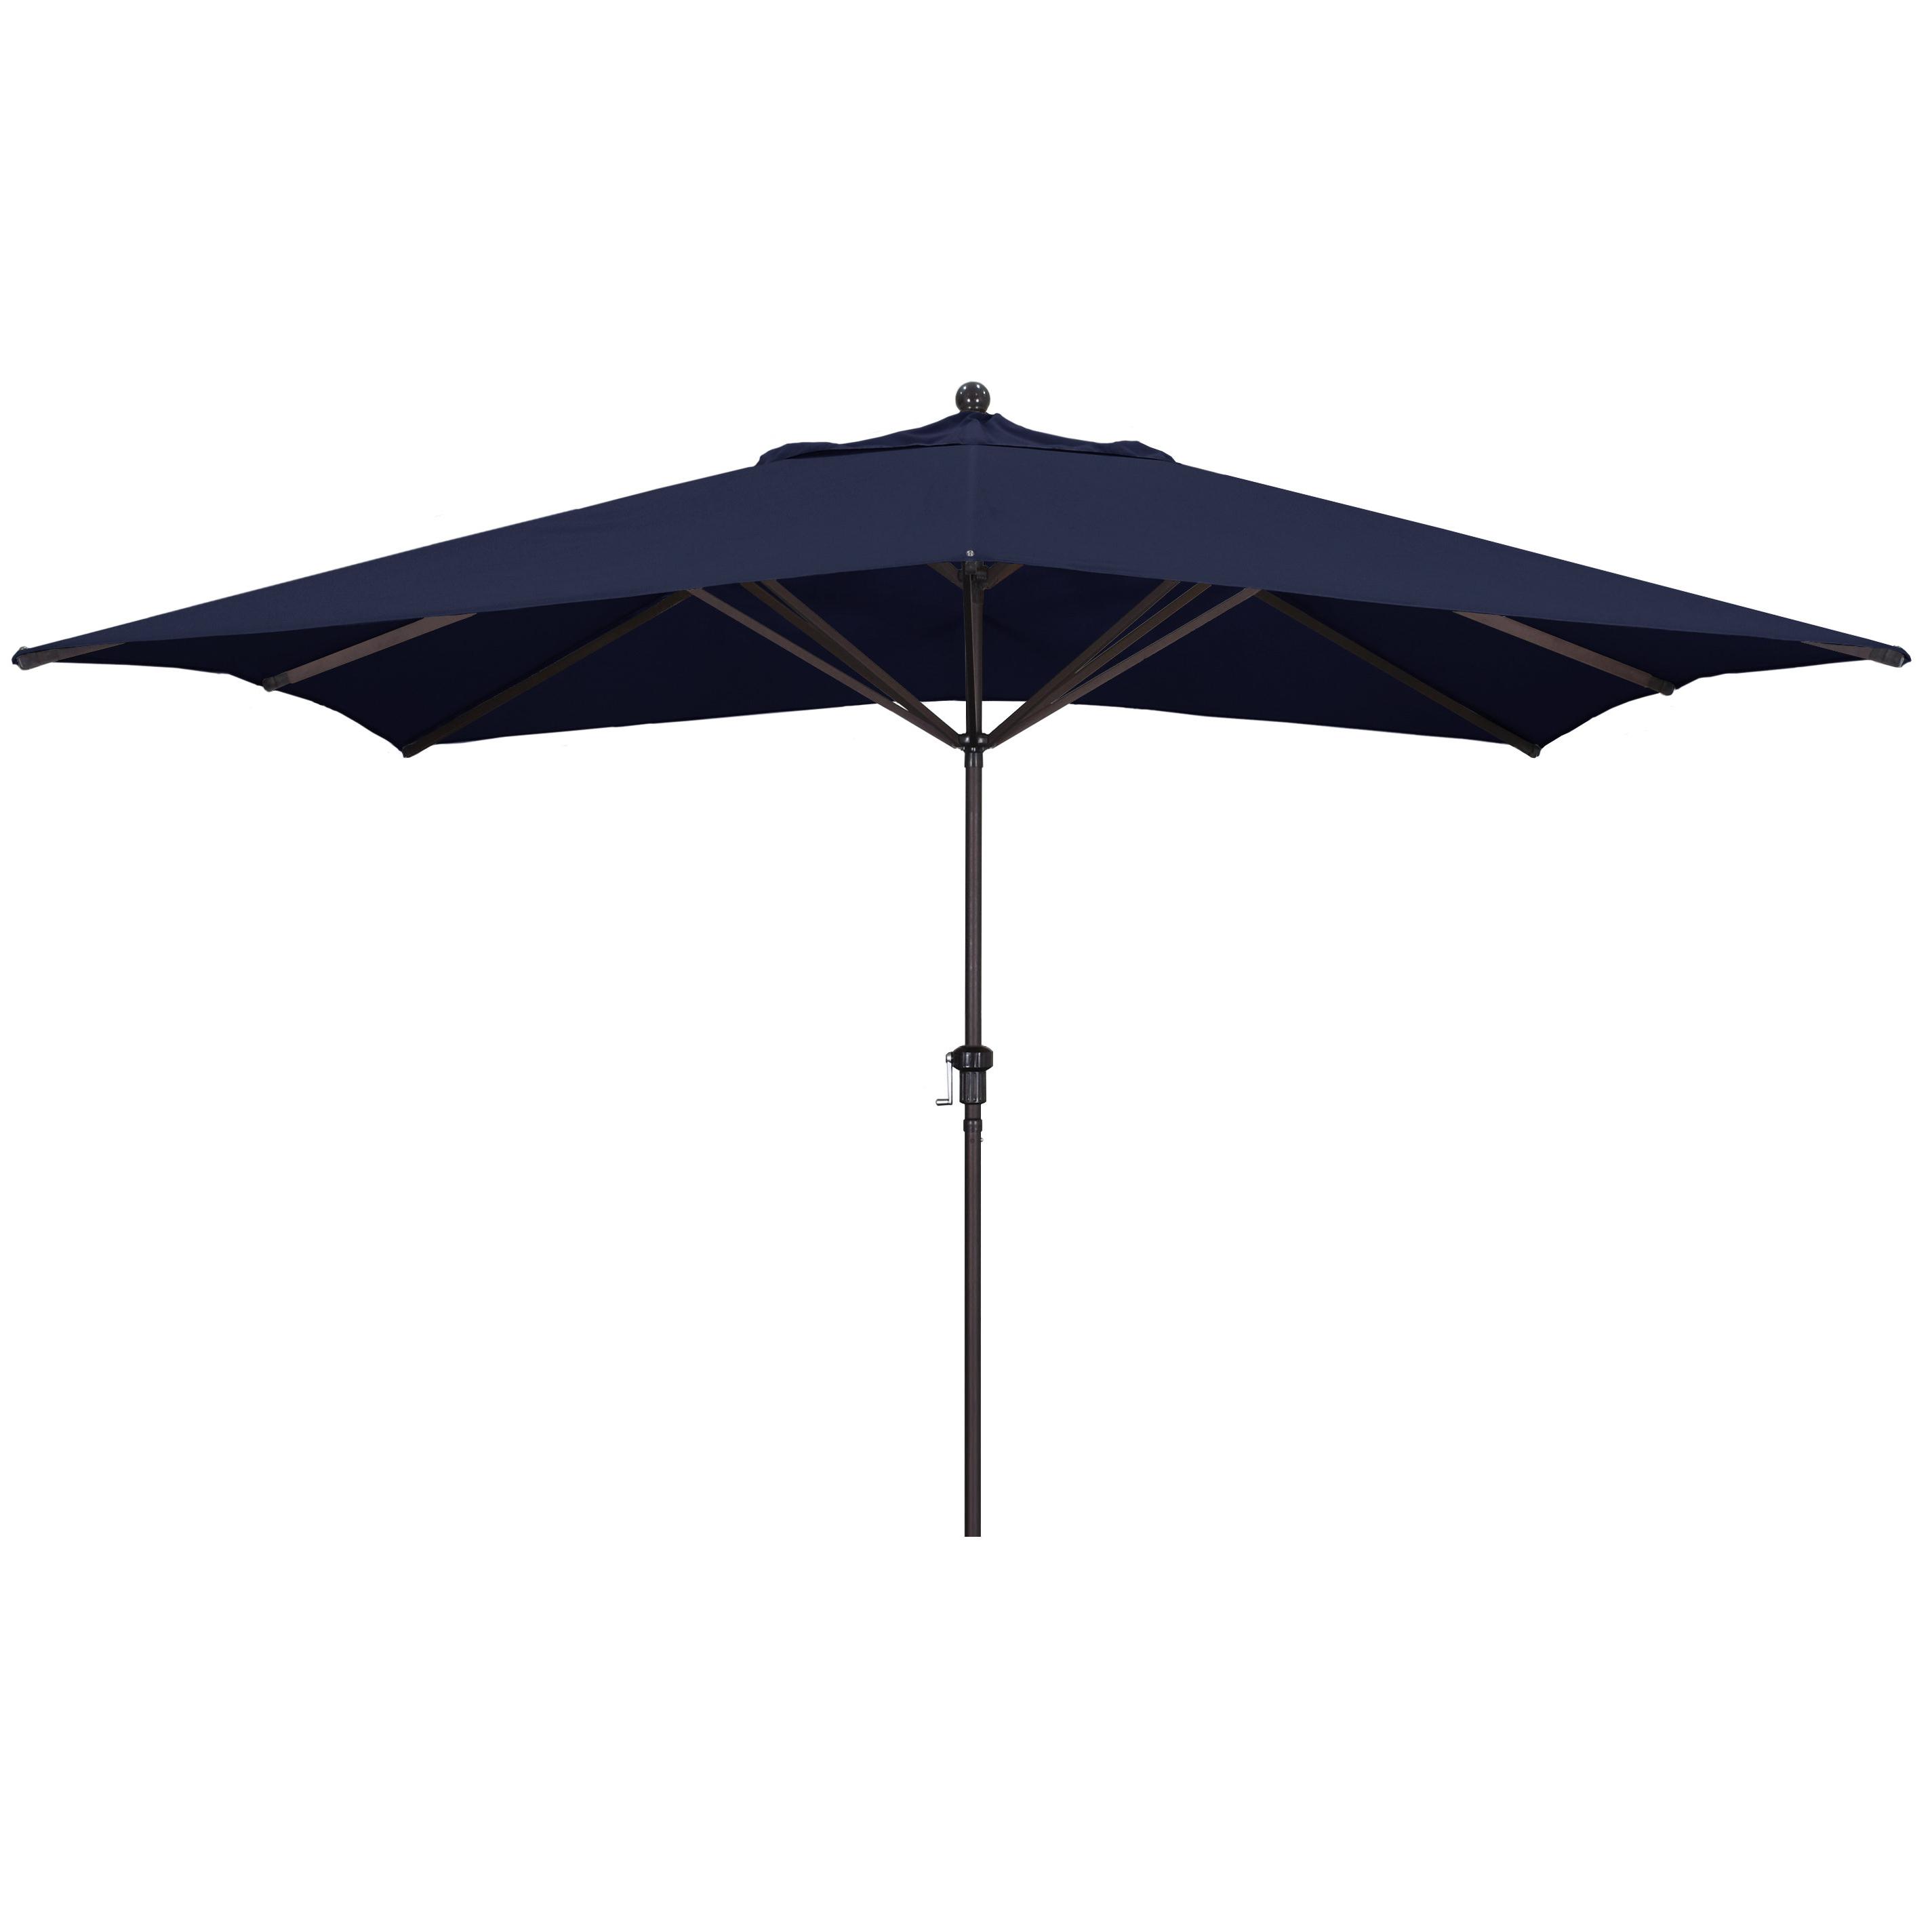 Launceston Market Umbrellas With Well Liked Carlton 11' X 8' Rectangular Market Umbrella (View 9 of 20)